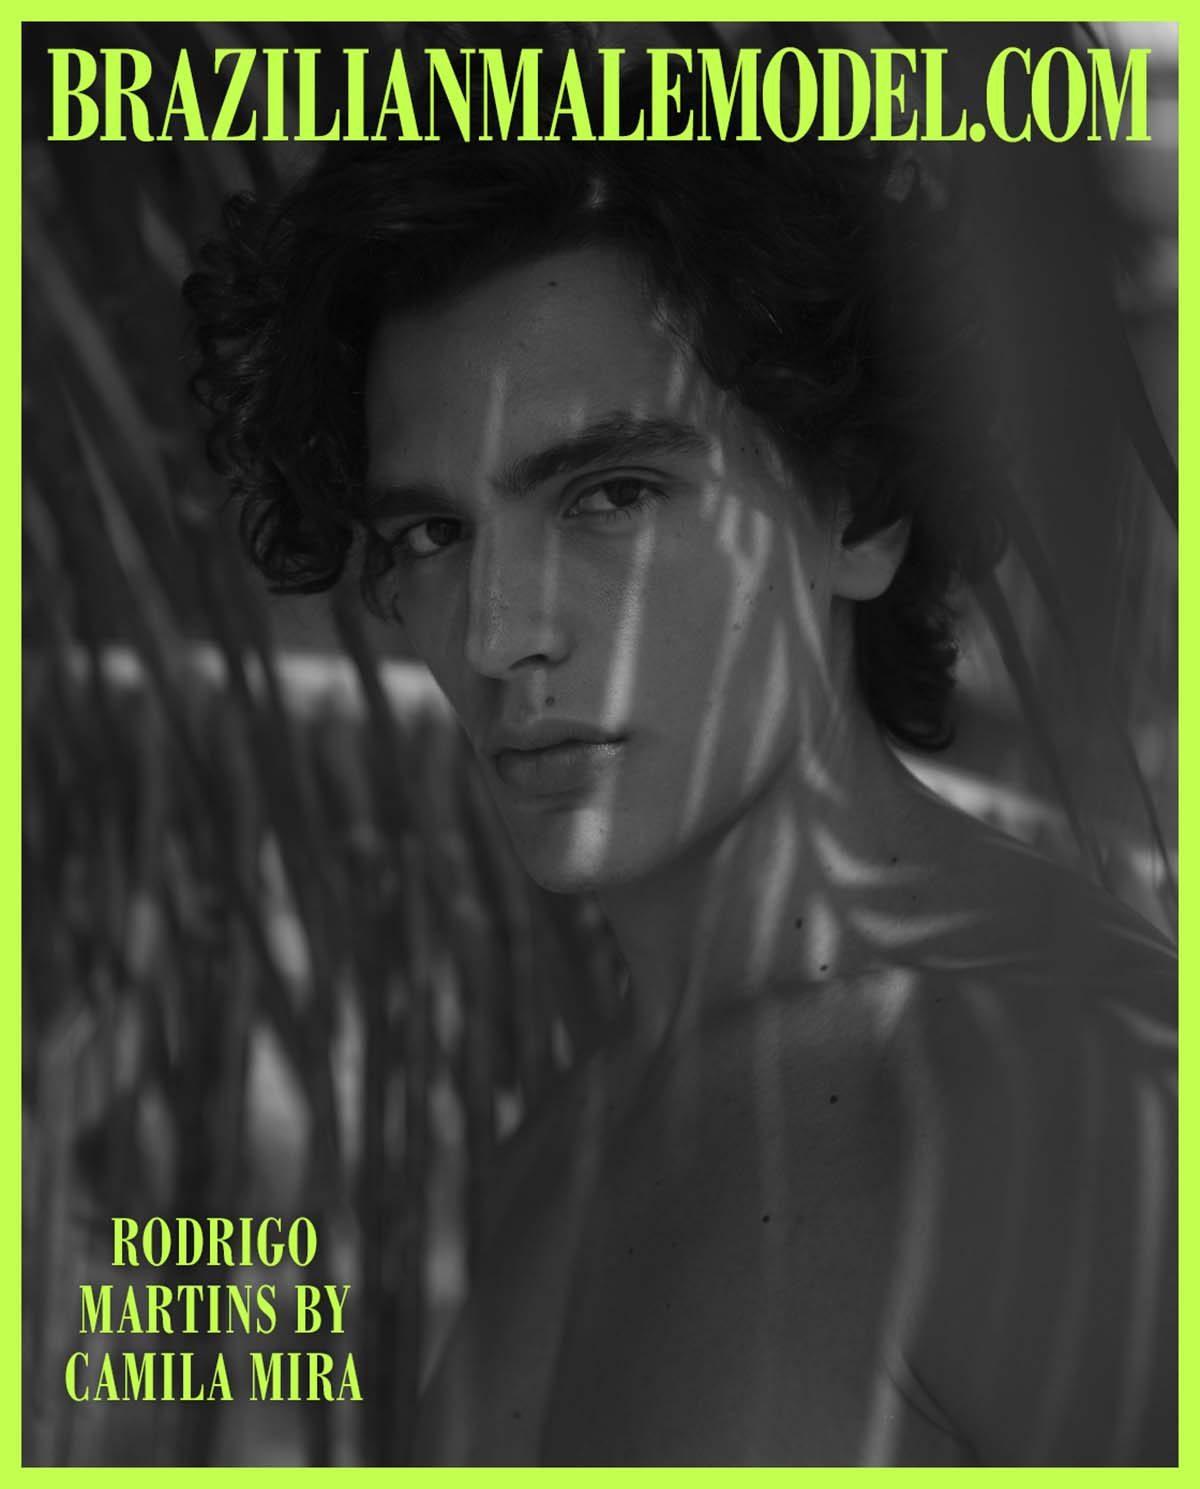 Rodrigo Martins by Camila Mira